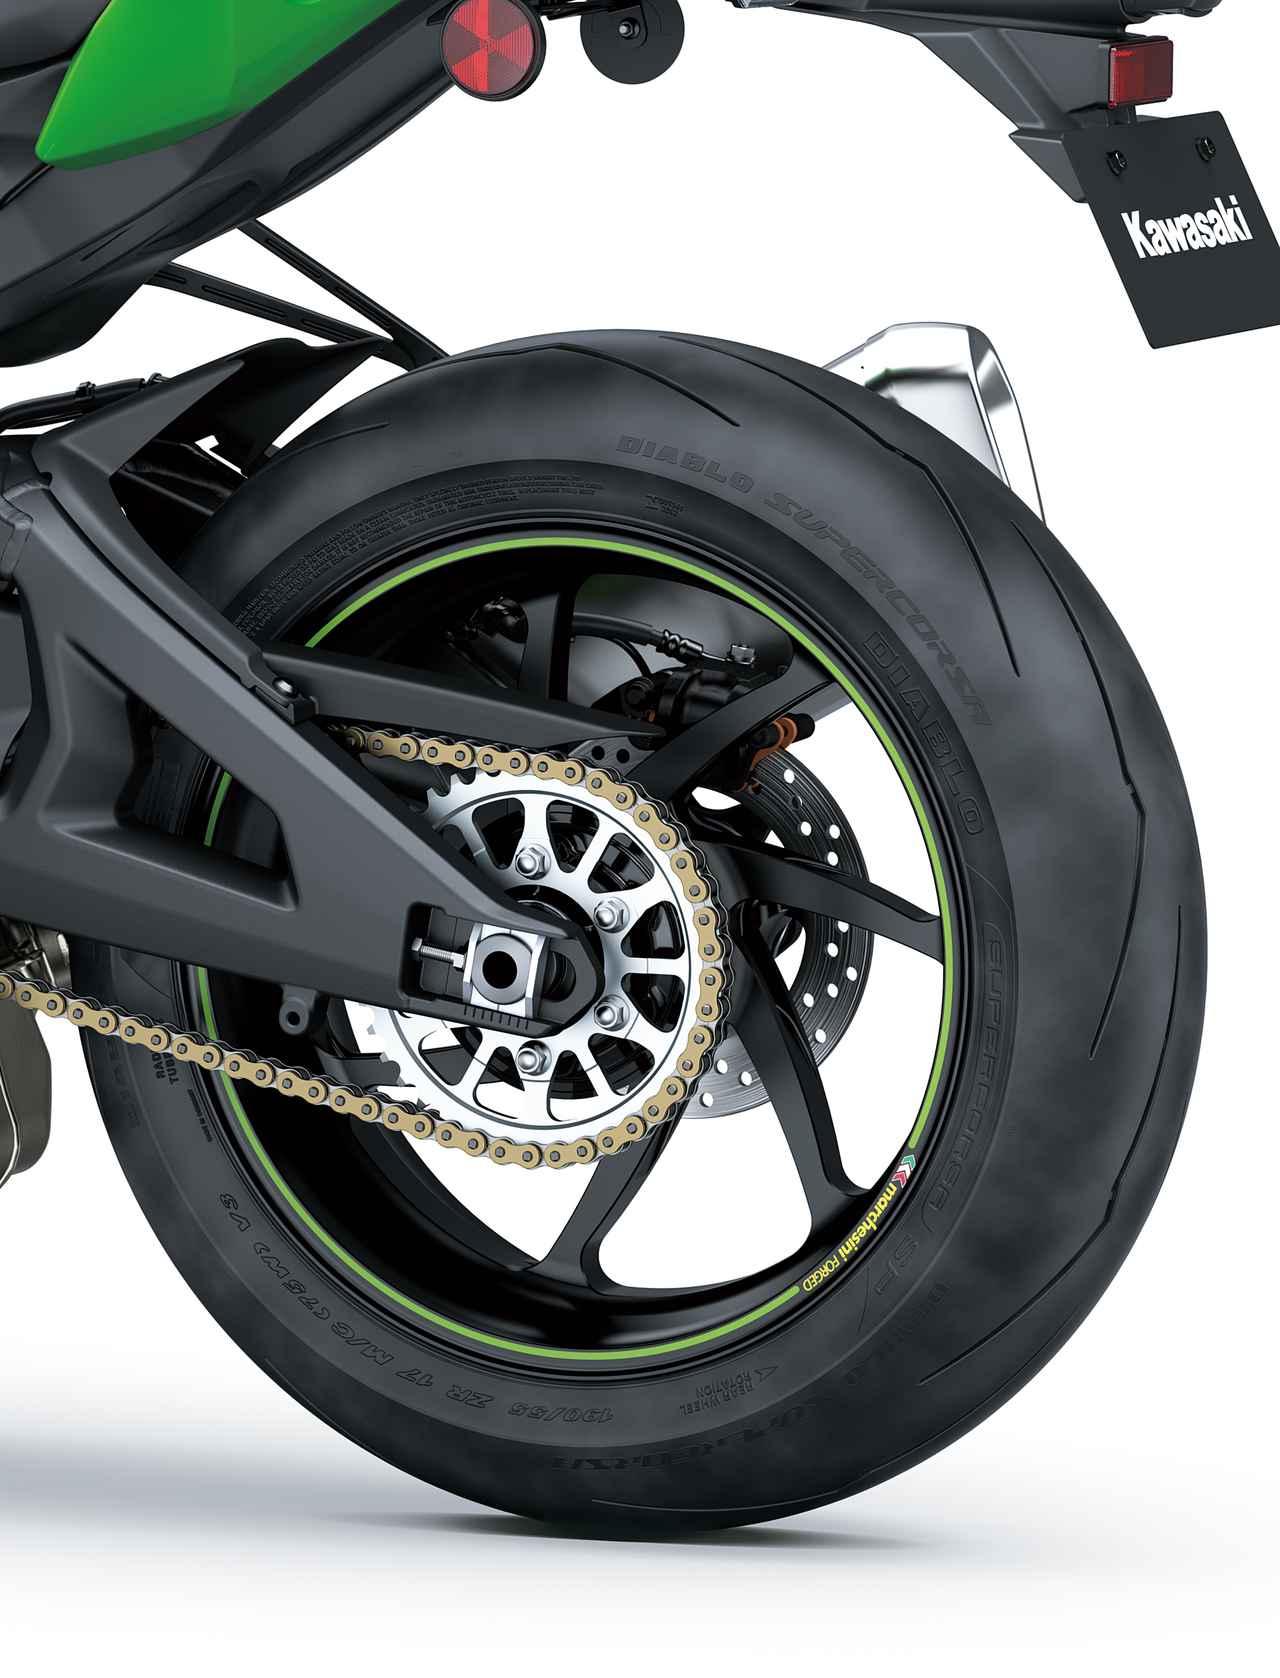 Images : 34番目の画像 - 【写真36枚】カワサキ 新型 Ninja ZX-10R/Ninja ZX-10RR - webオートバイ